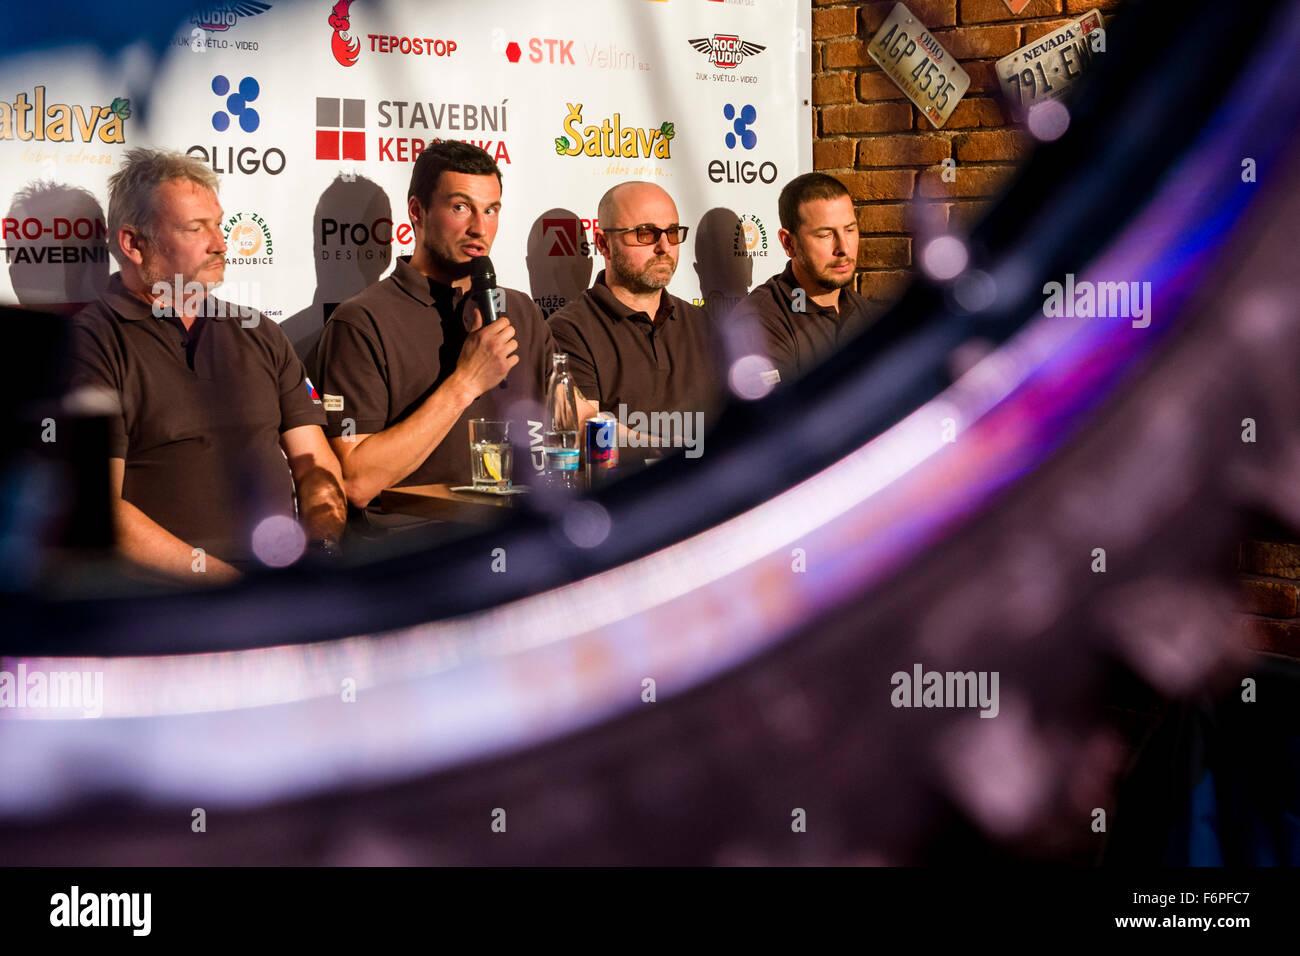 Pardubice, Czech Republic. 18th Nov, 2015. The team Klymciw Racing (from left) Josef Klymciw, Ondrej Klymciw, Ivan - Stock Image